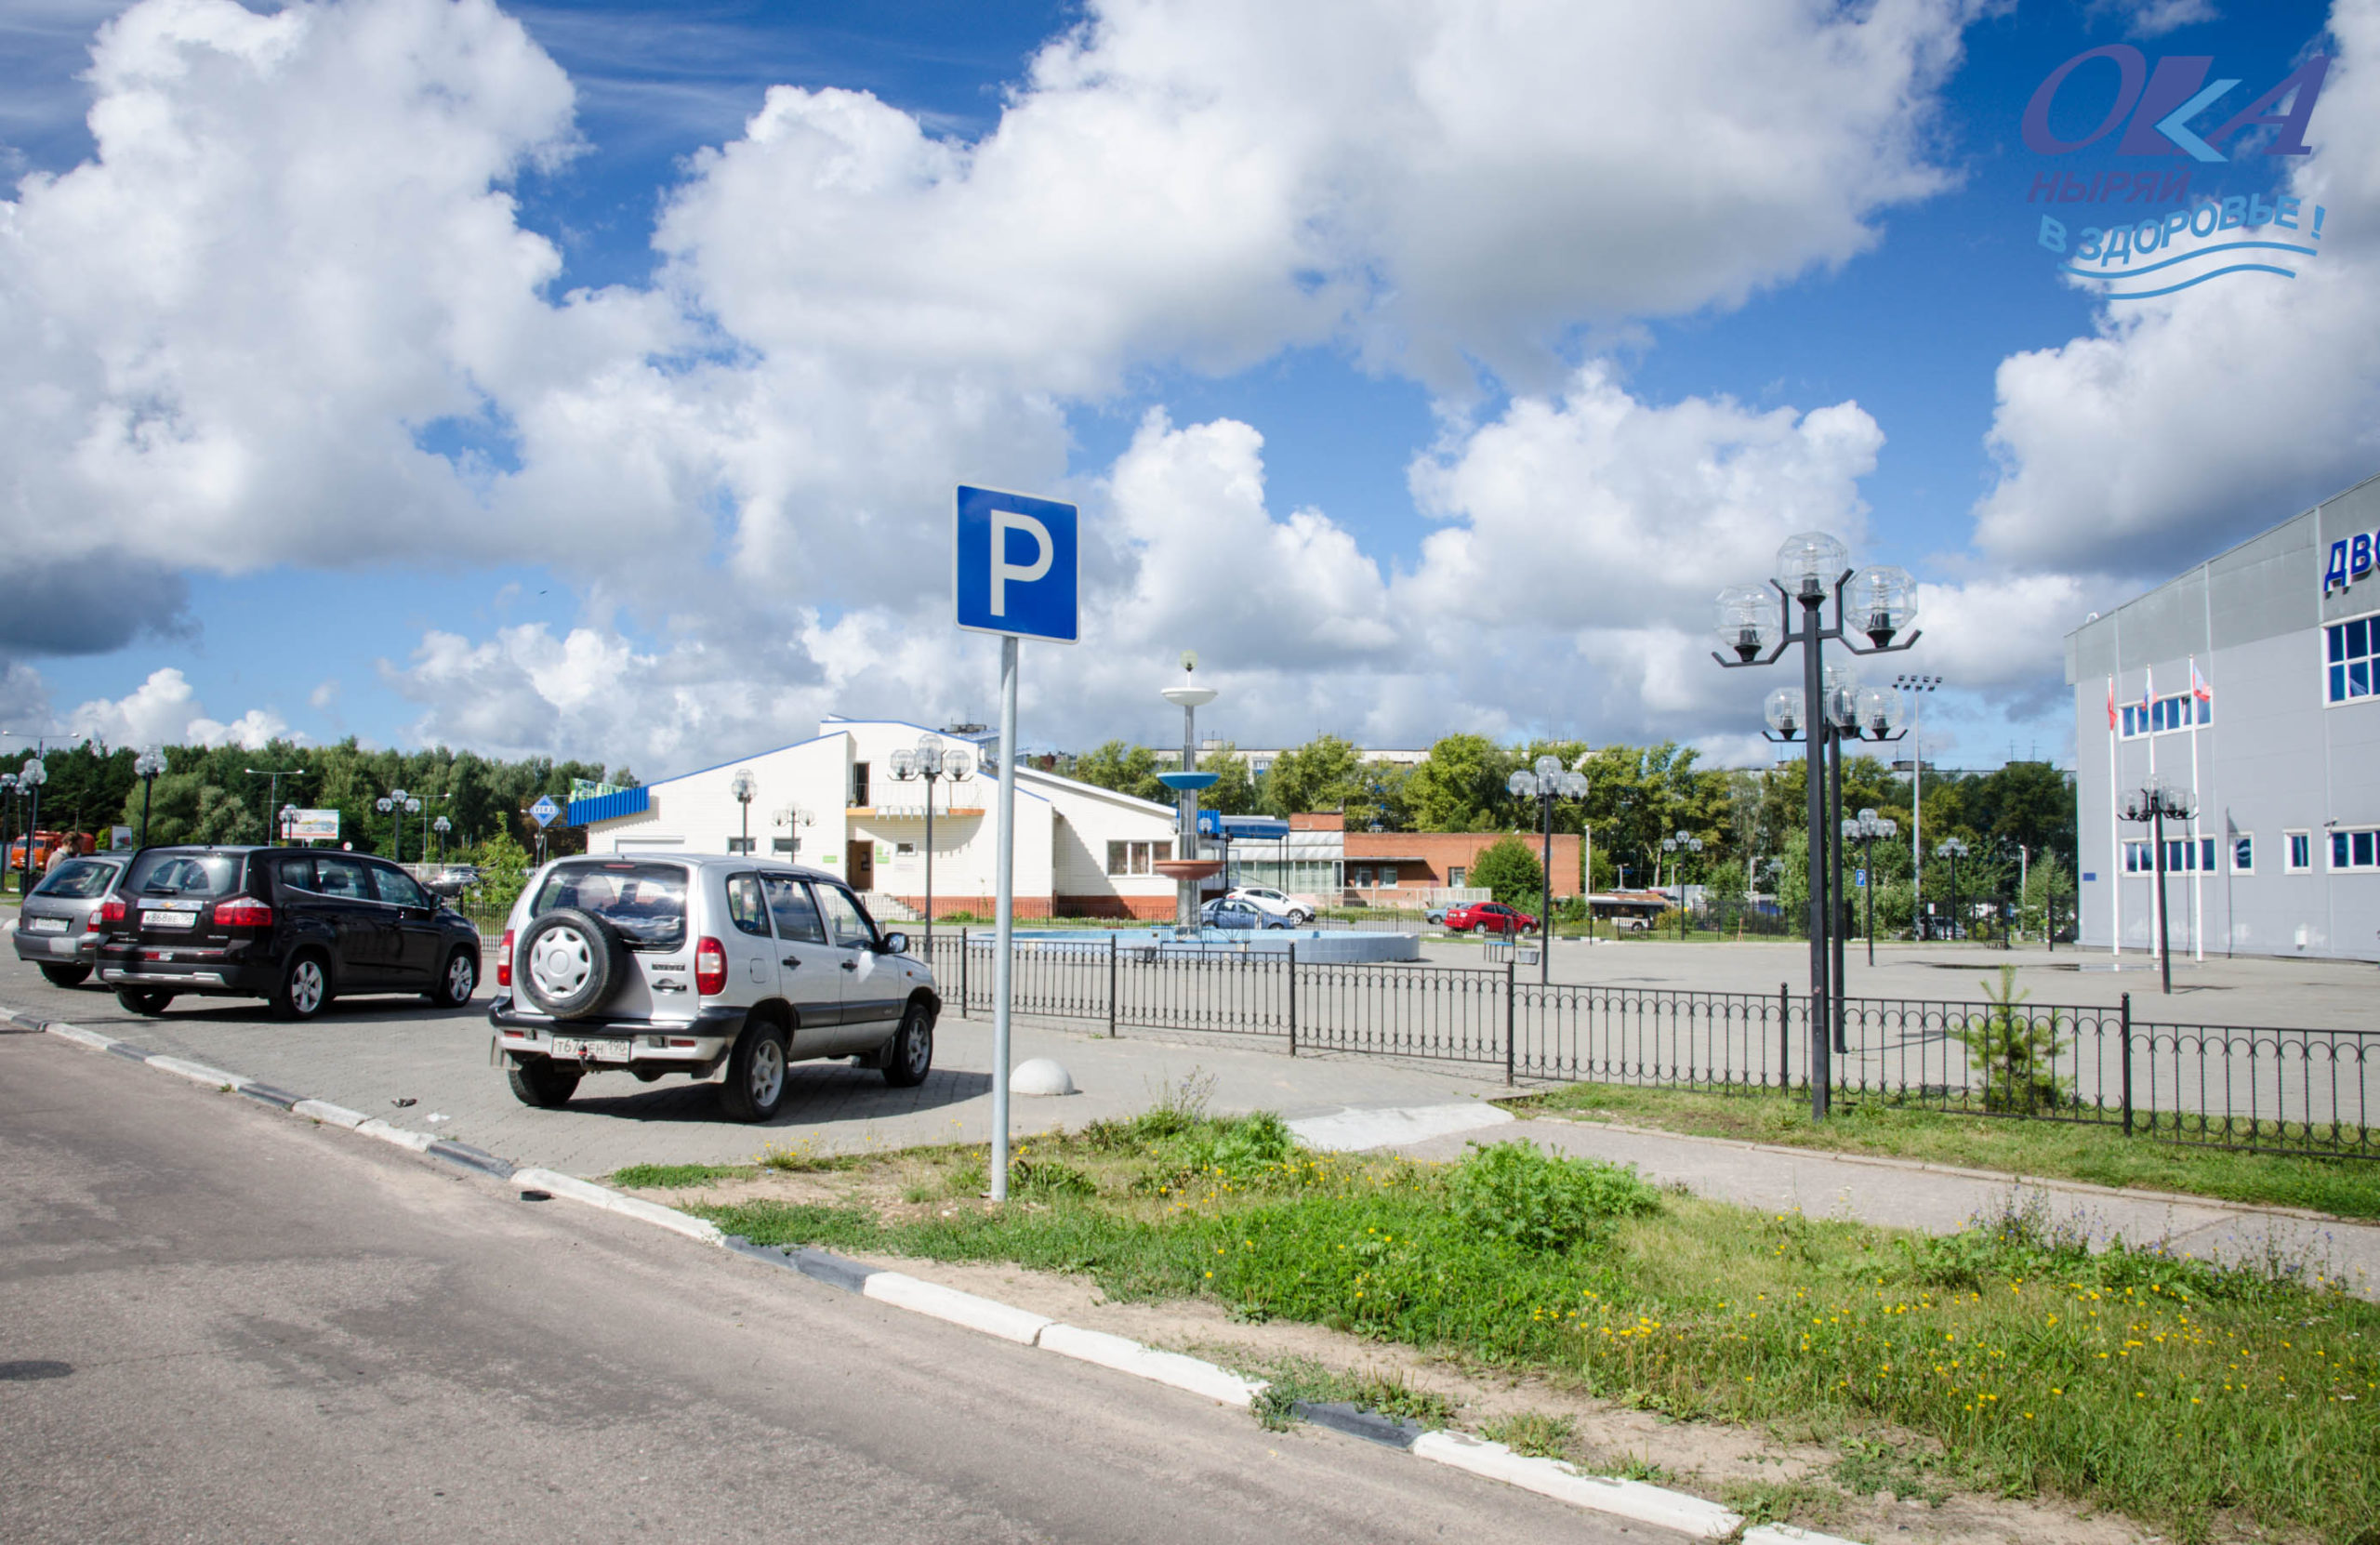 Установлен знак разрешающий парковку.